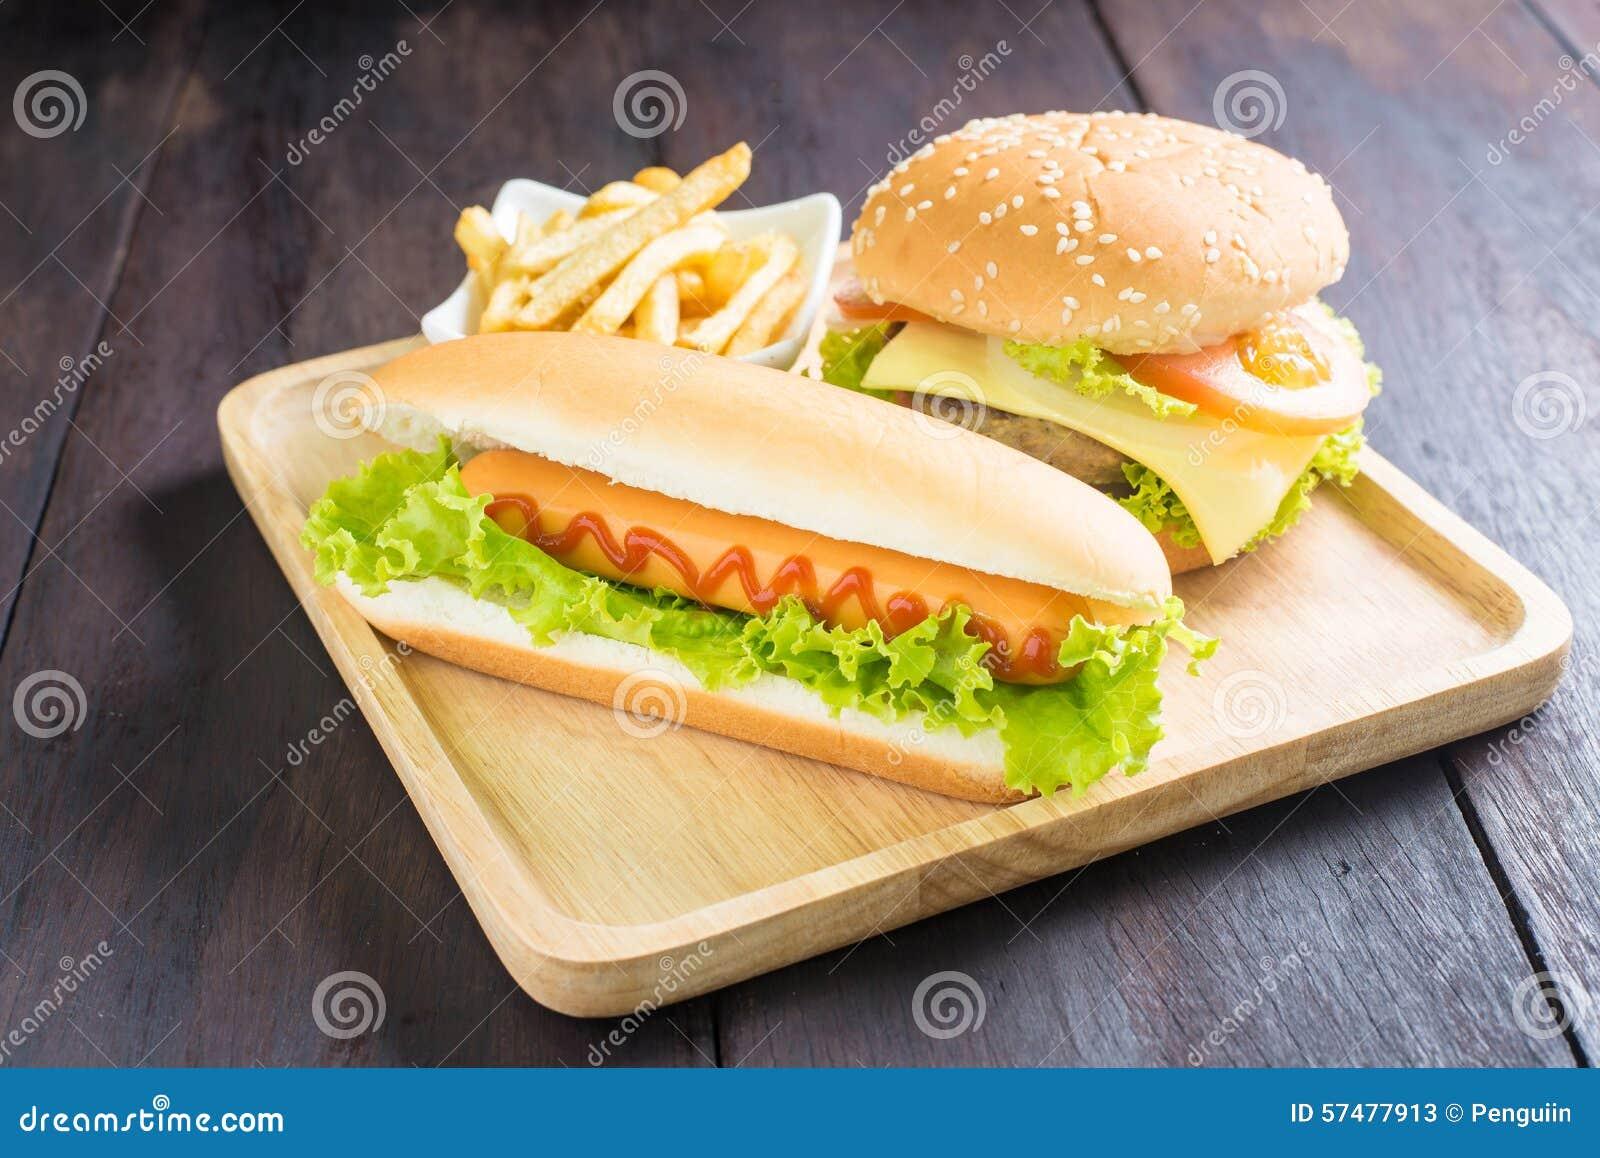 Hamburger, Hotdog, Pommes-Frites auf dem Holz